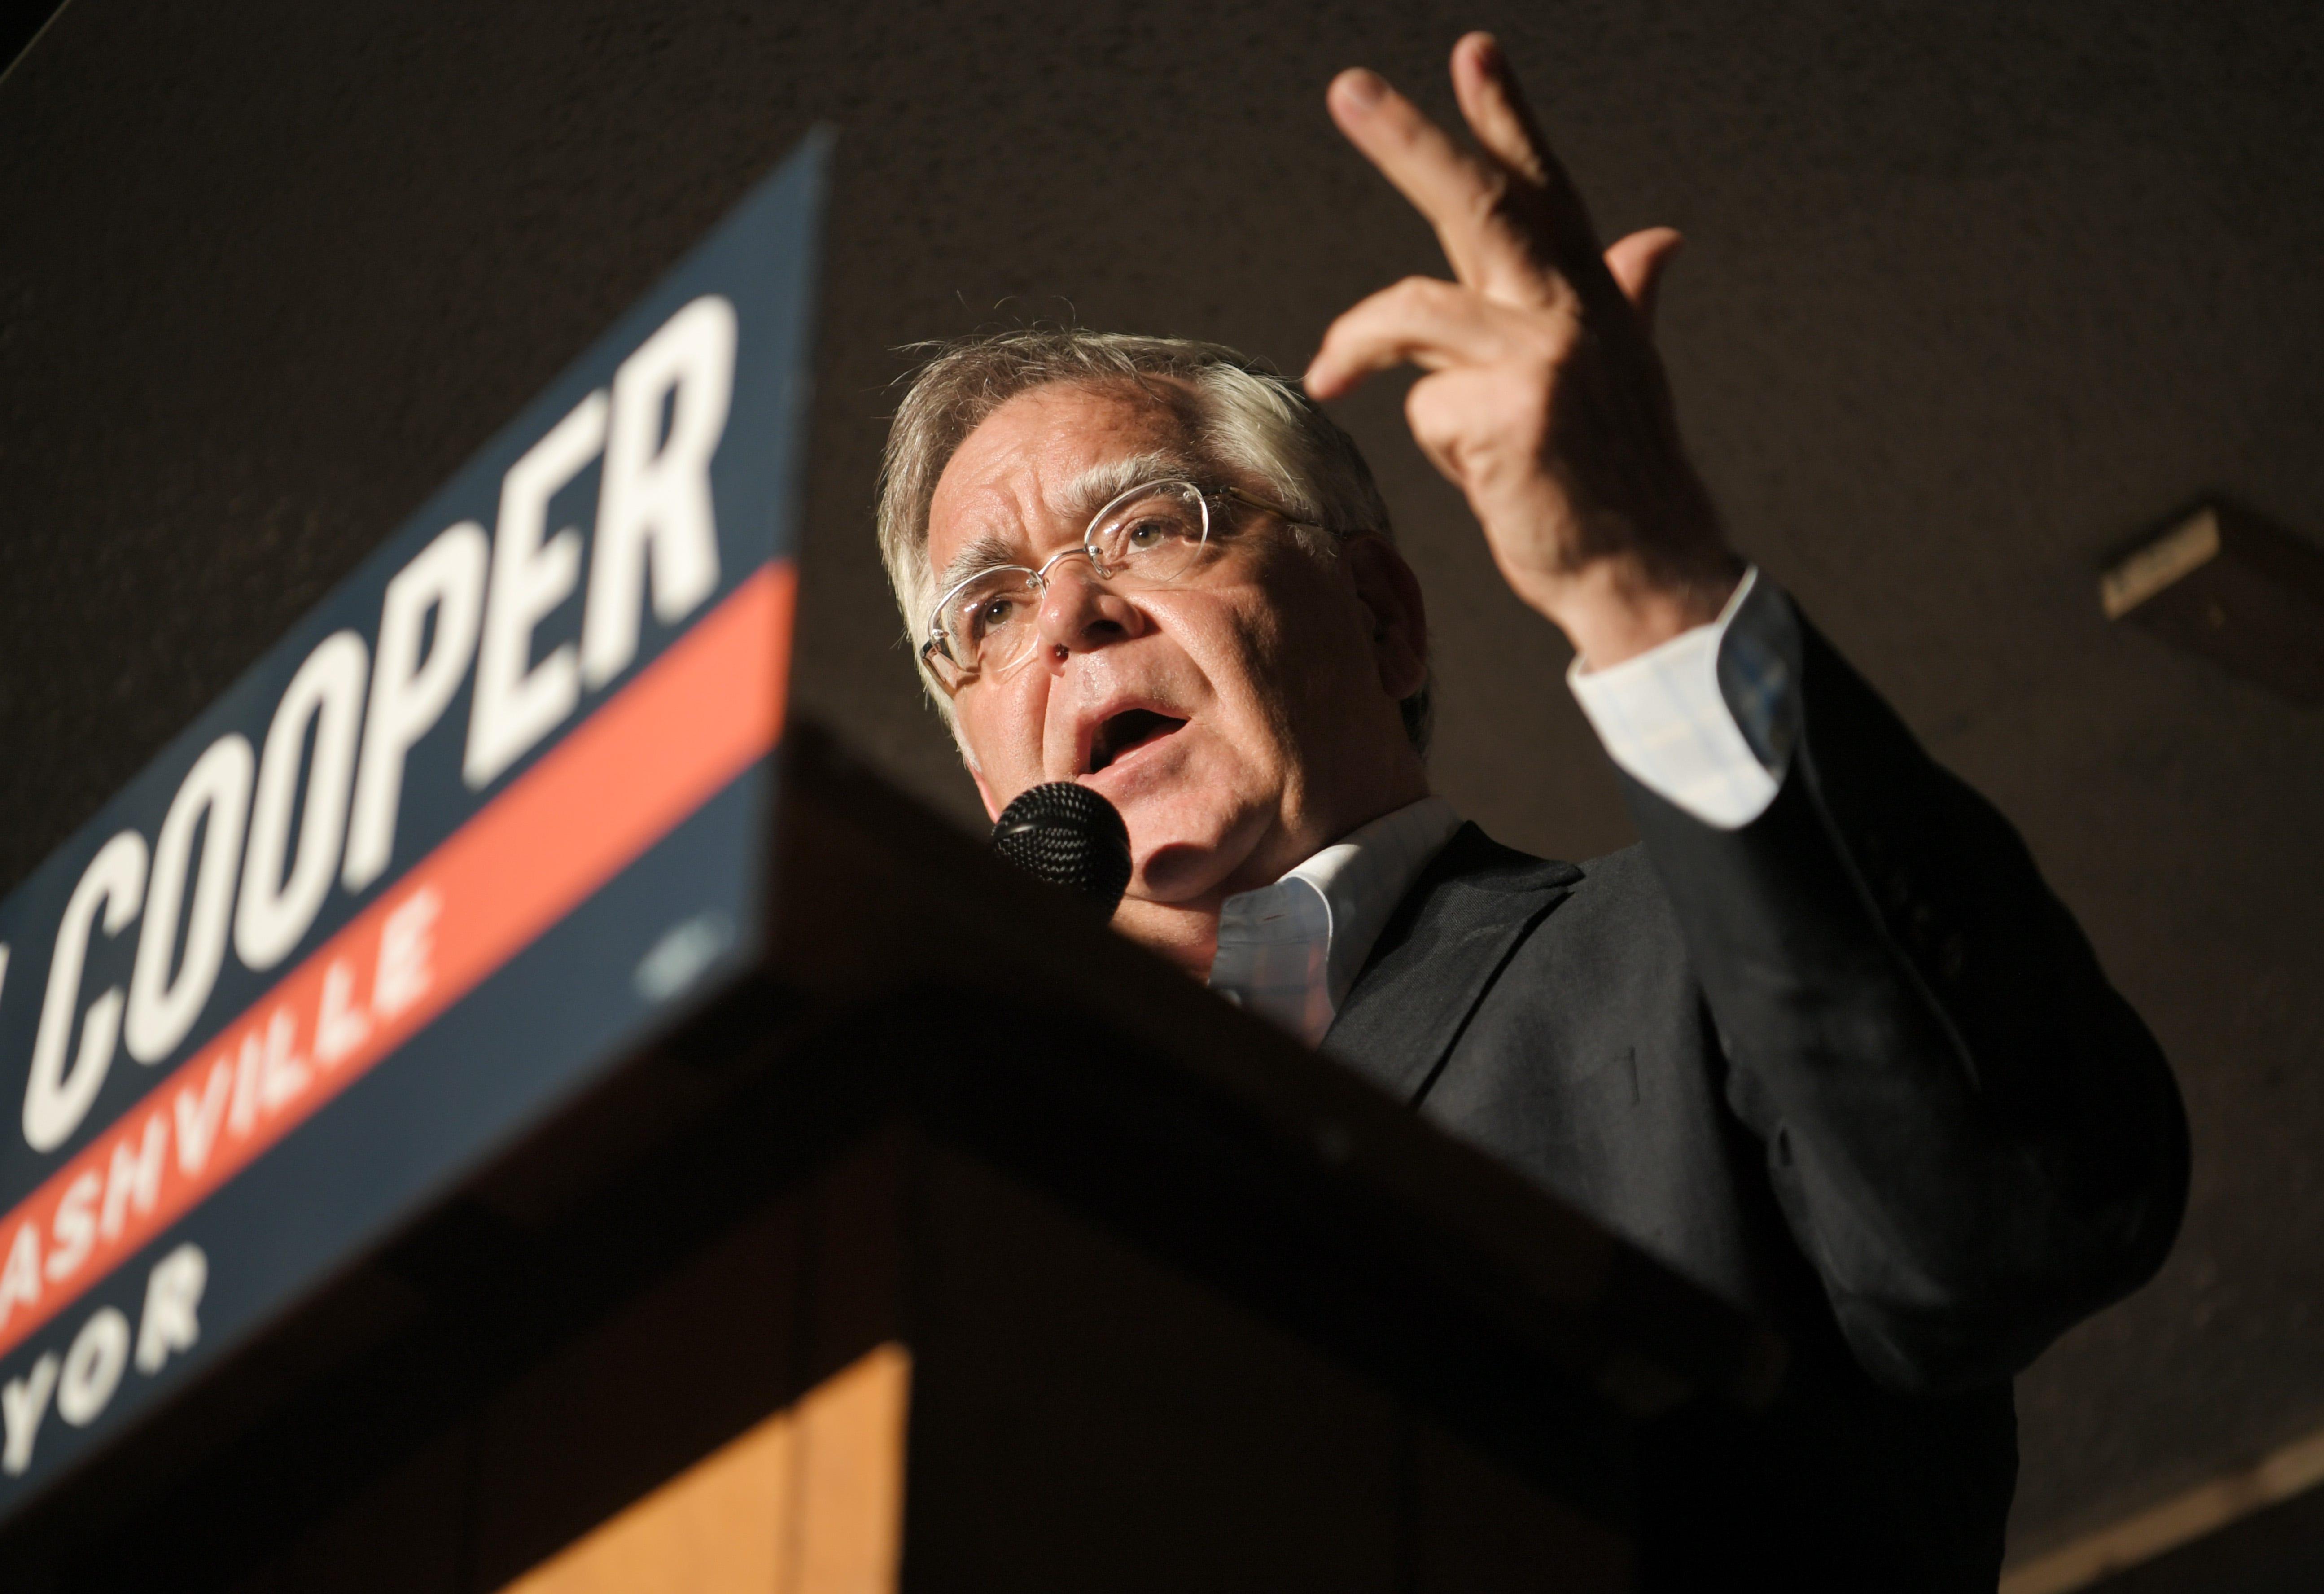 Nashville mayor election: Cooper holds sizable lead over